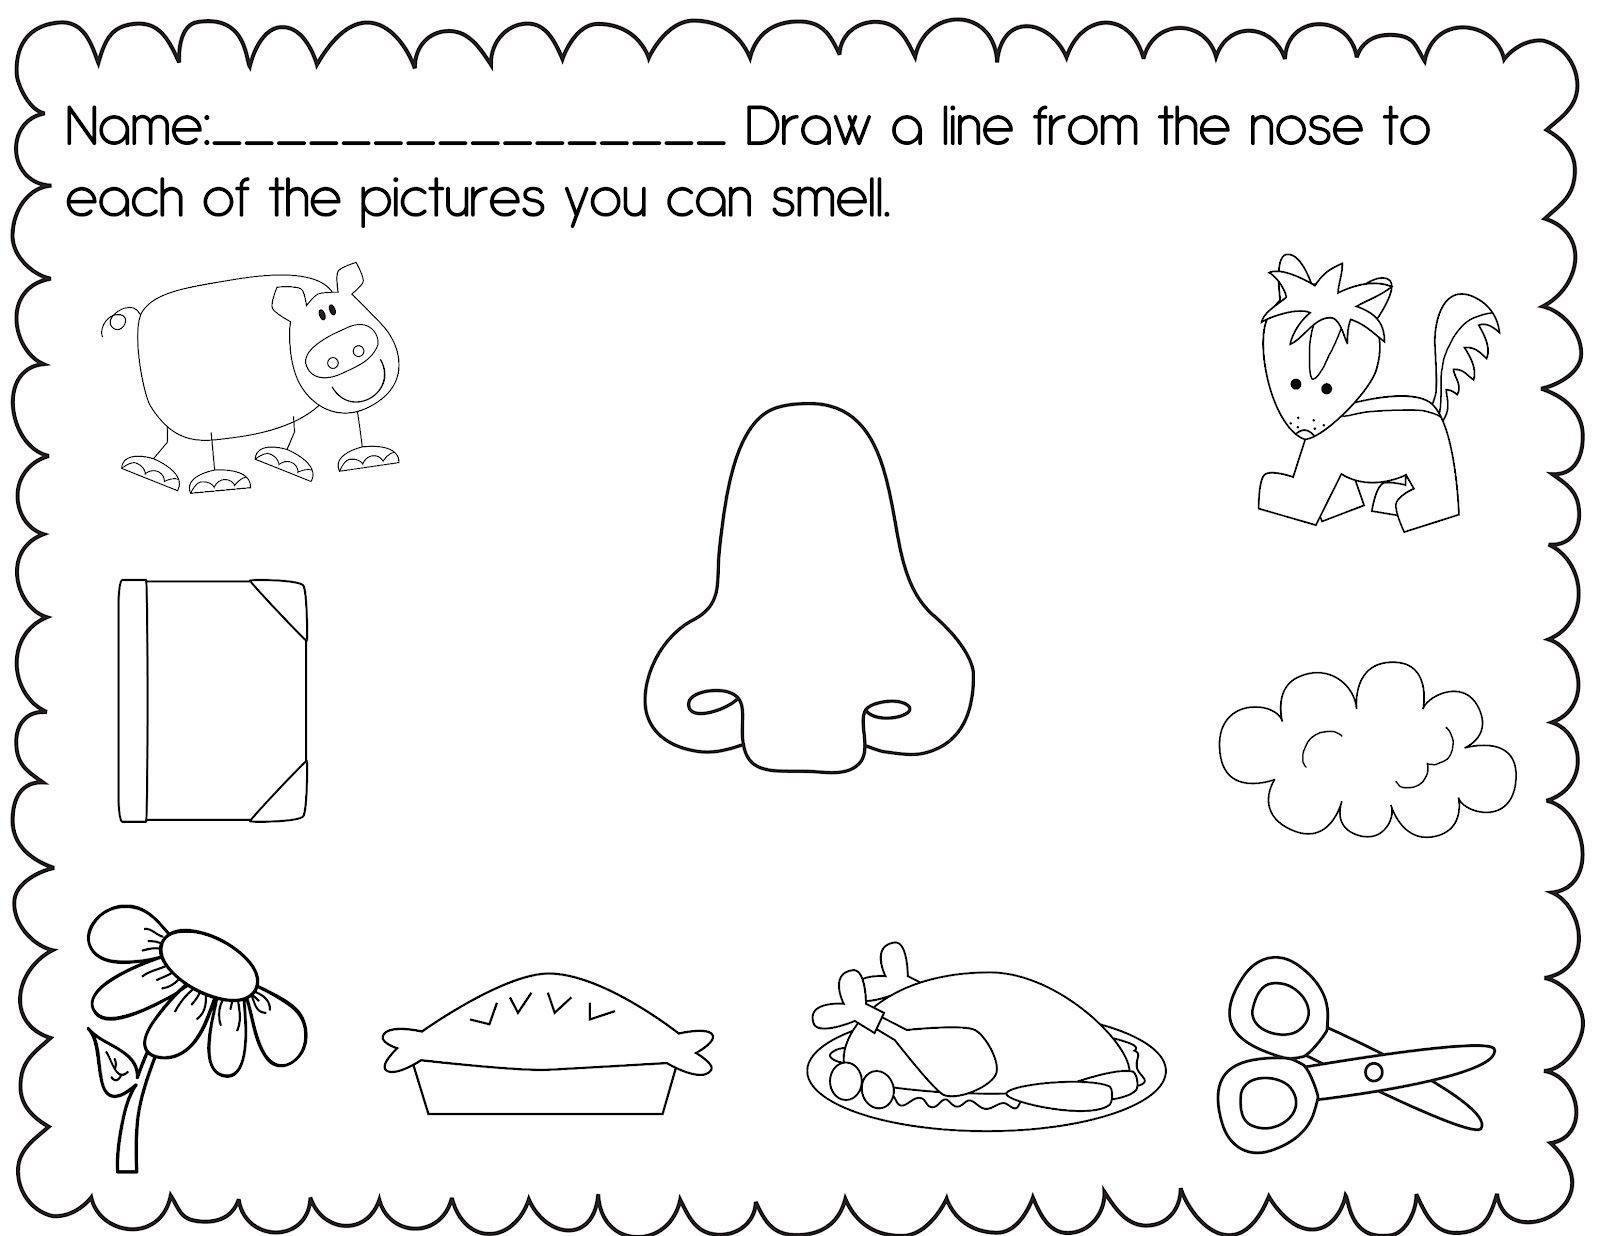 Smell Worksheet Senses Preschool Worksheets For Kids English Worksheets For Kindergarten